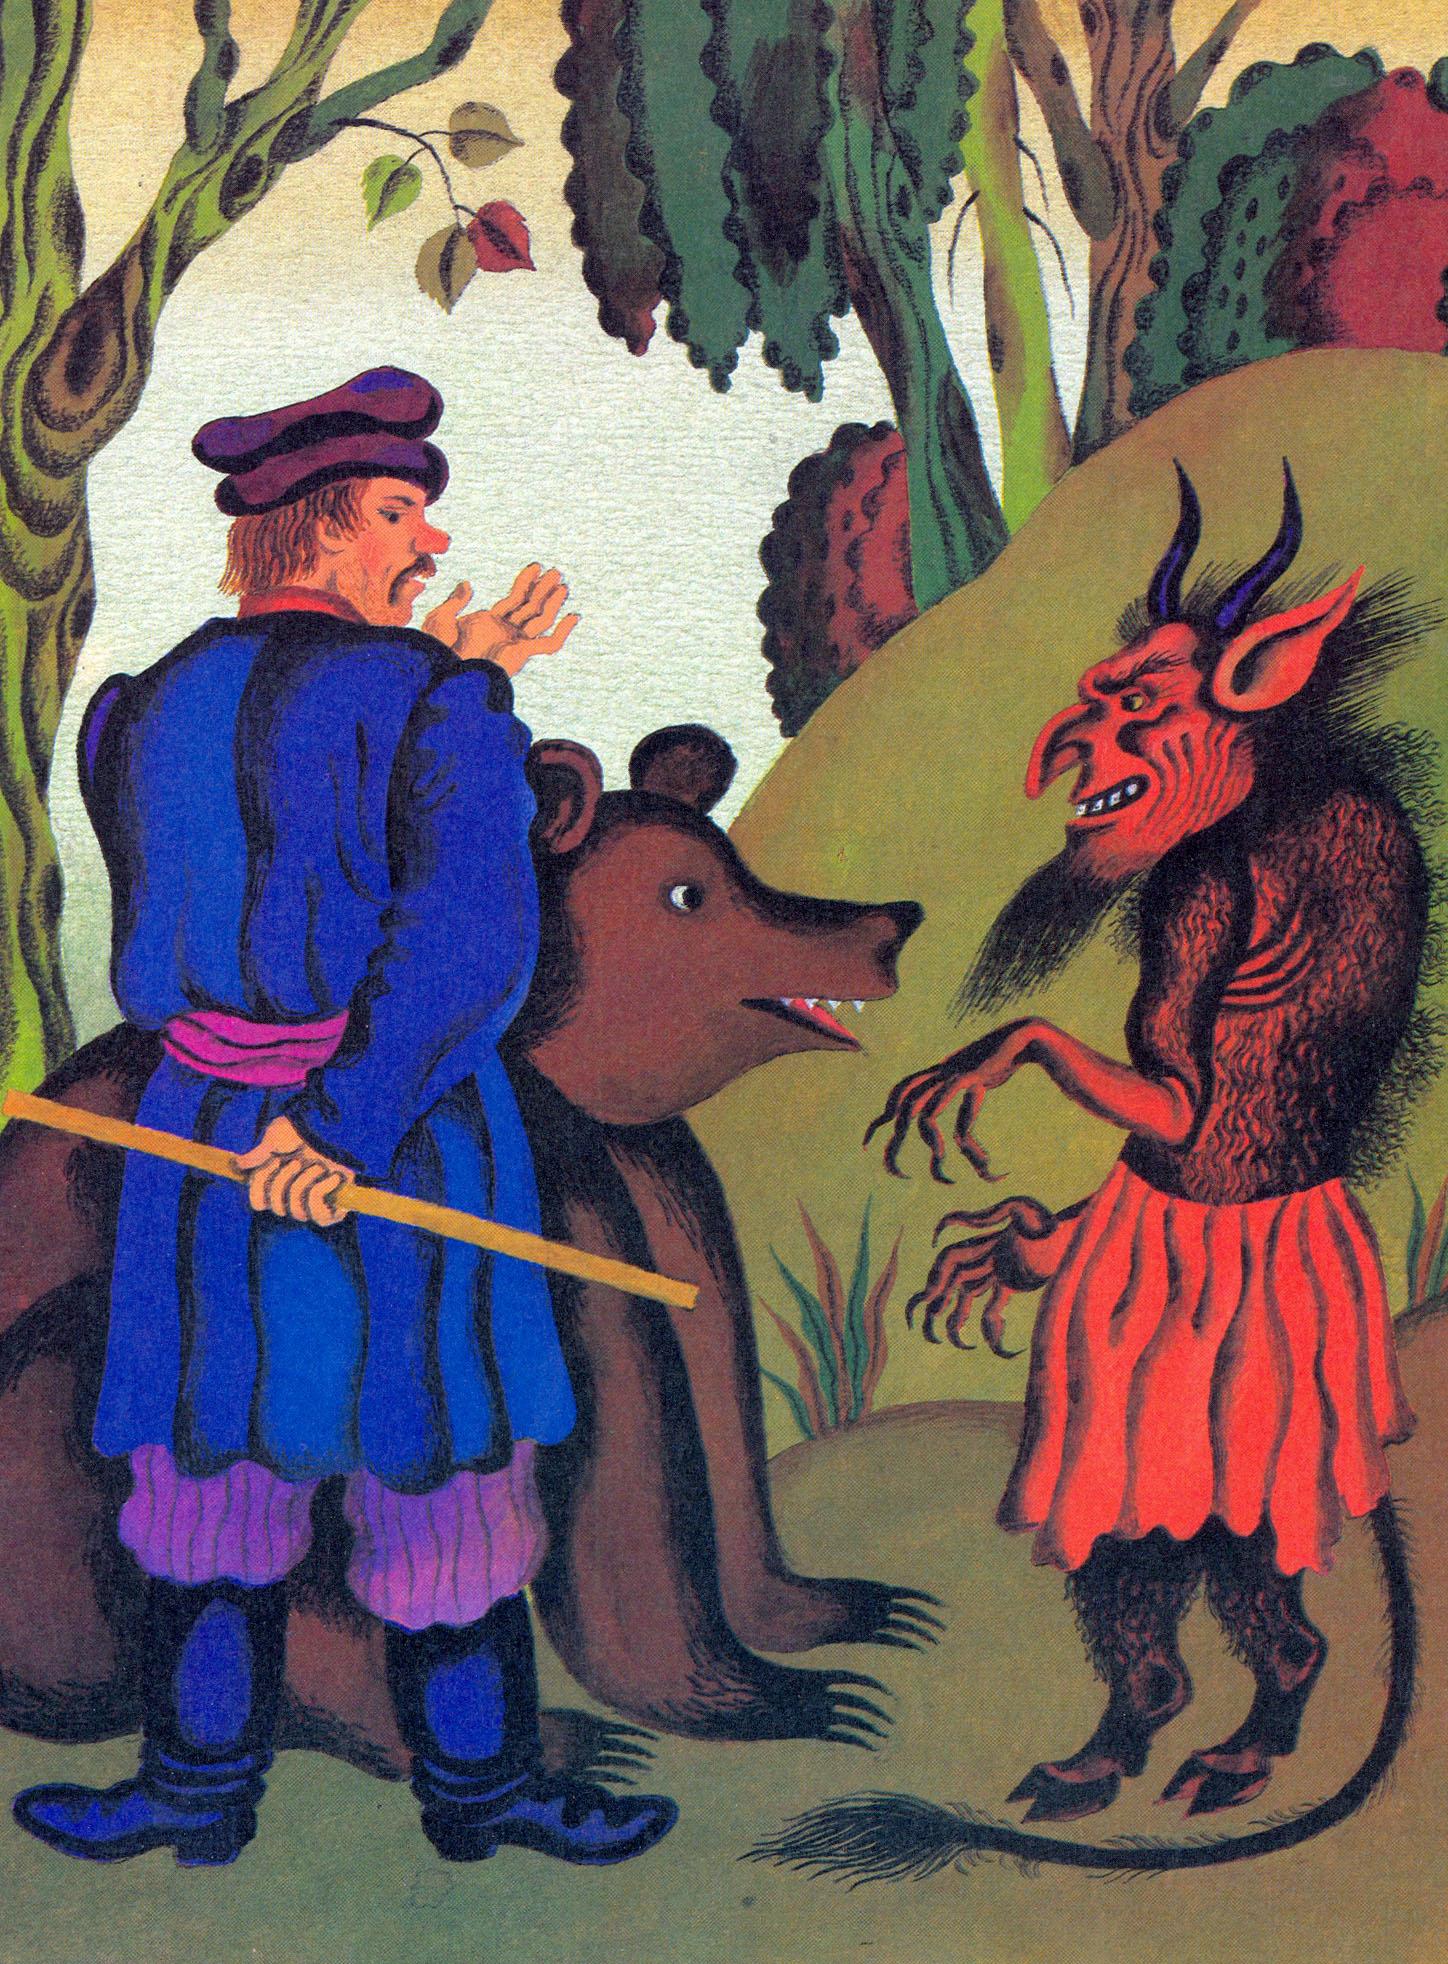 тоже картинки из мордовских сказок это ключ знаниям